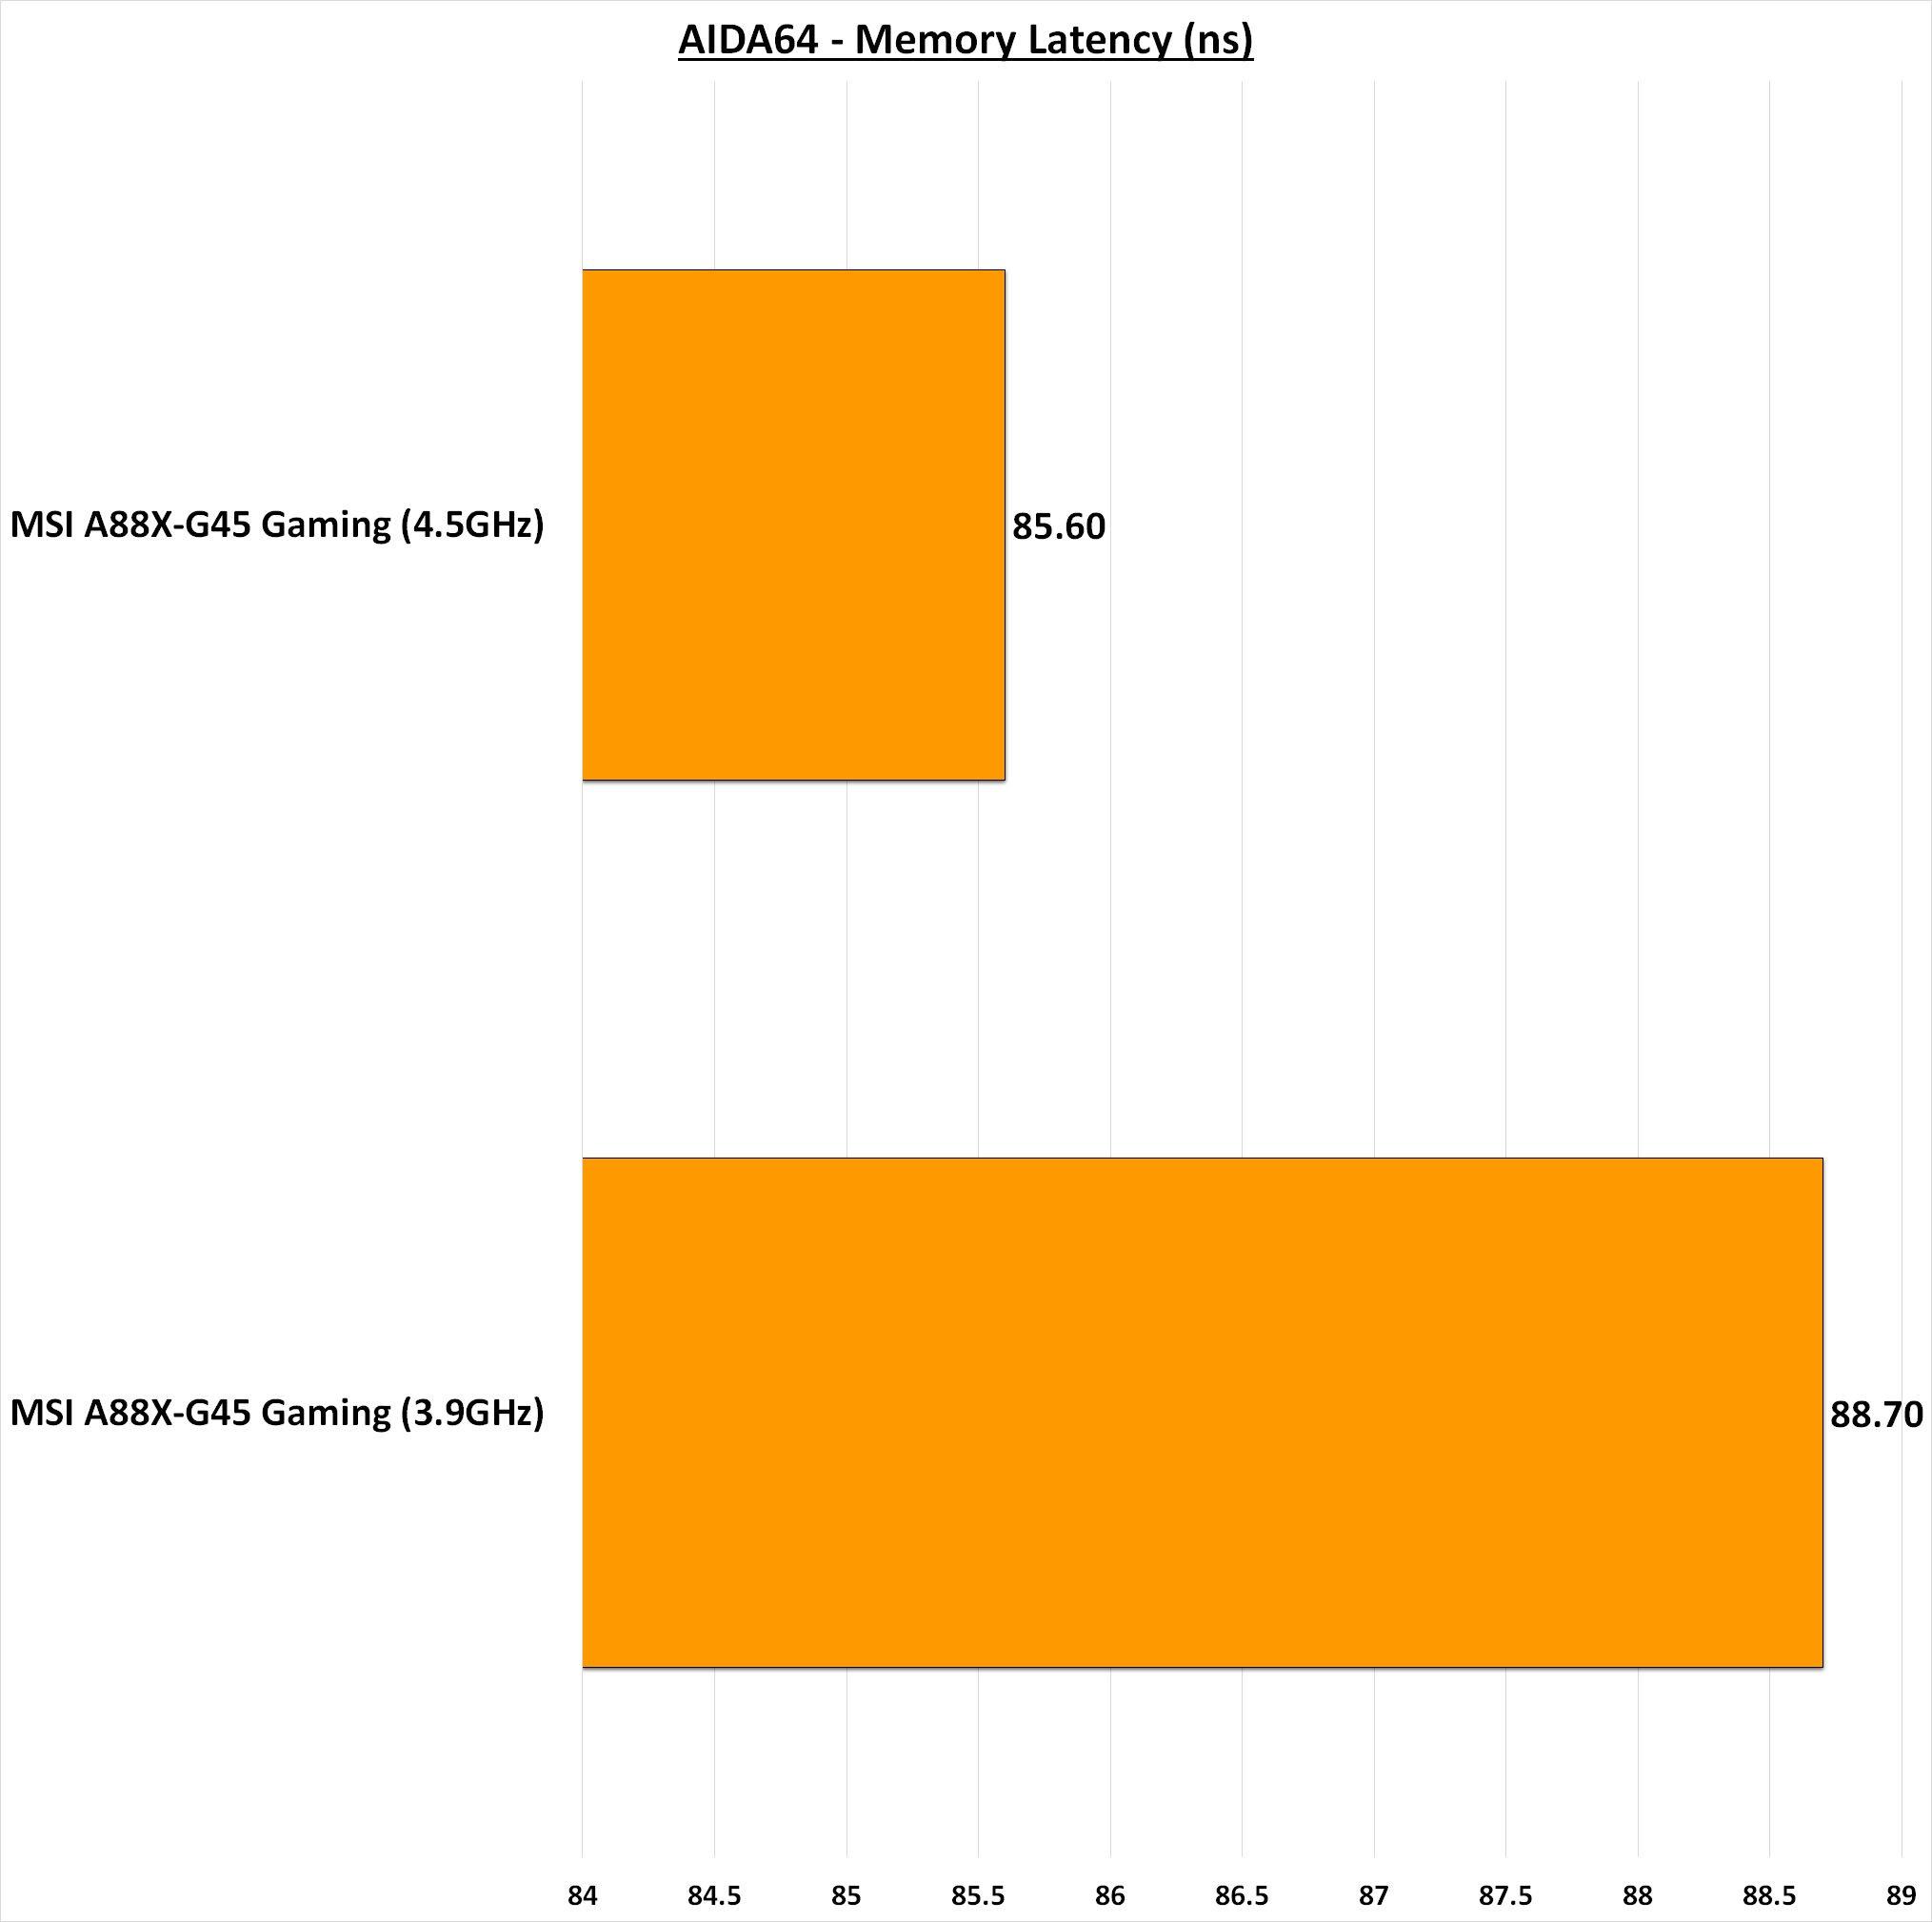 MSI A88X-G45 Gaming AIDA64 Memory Latency